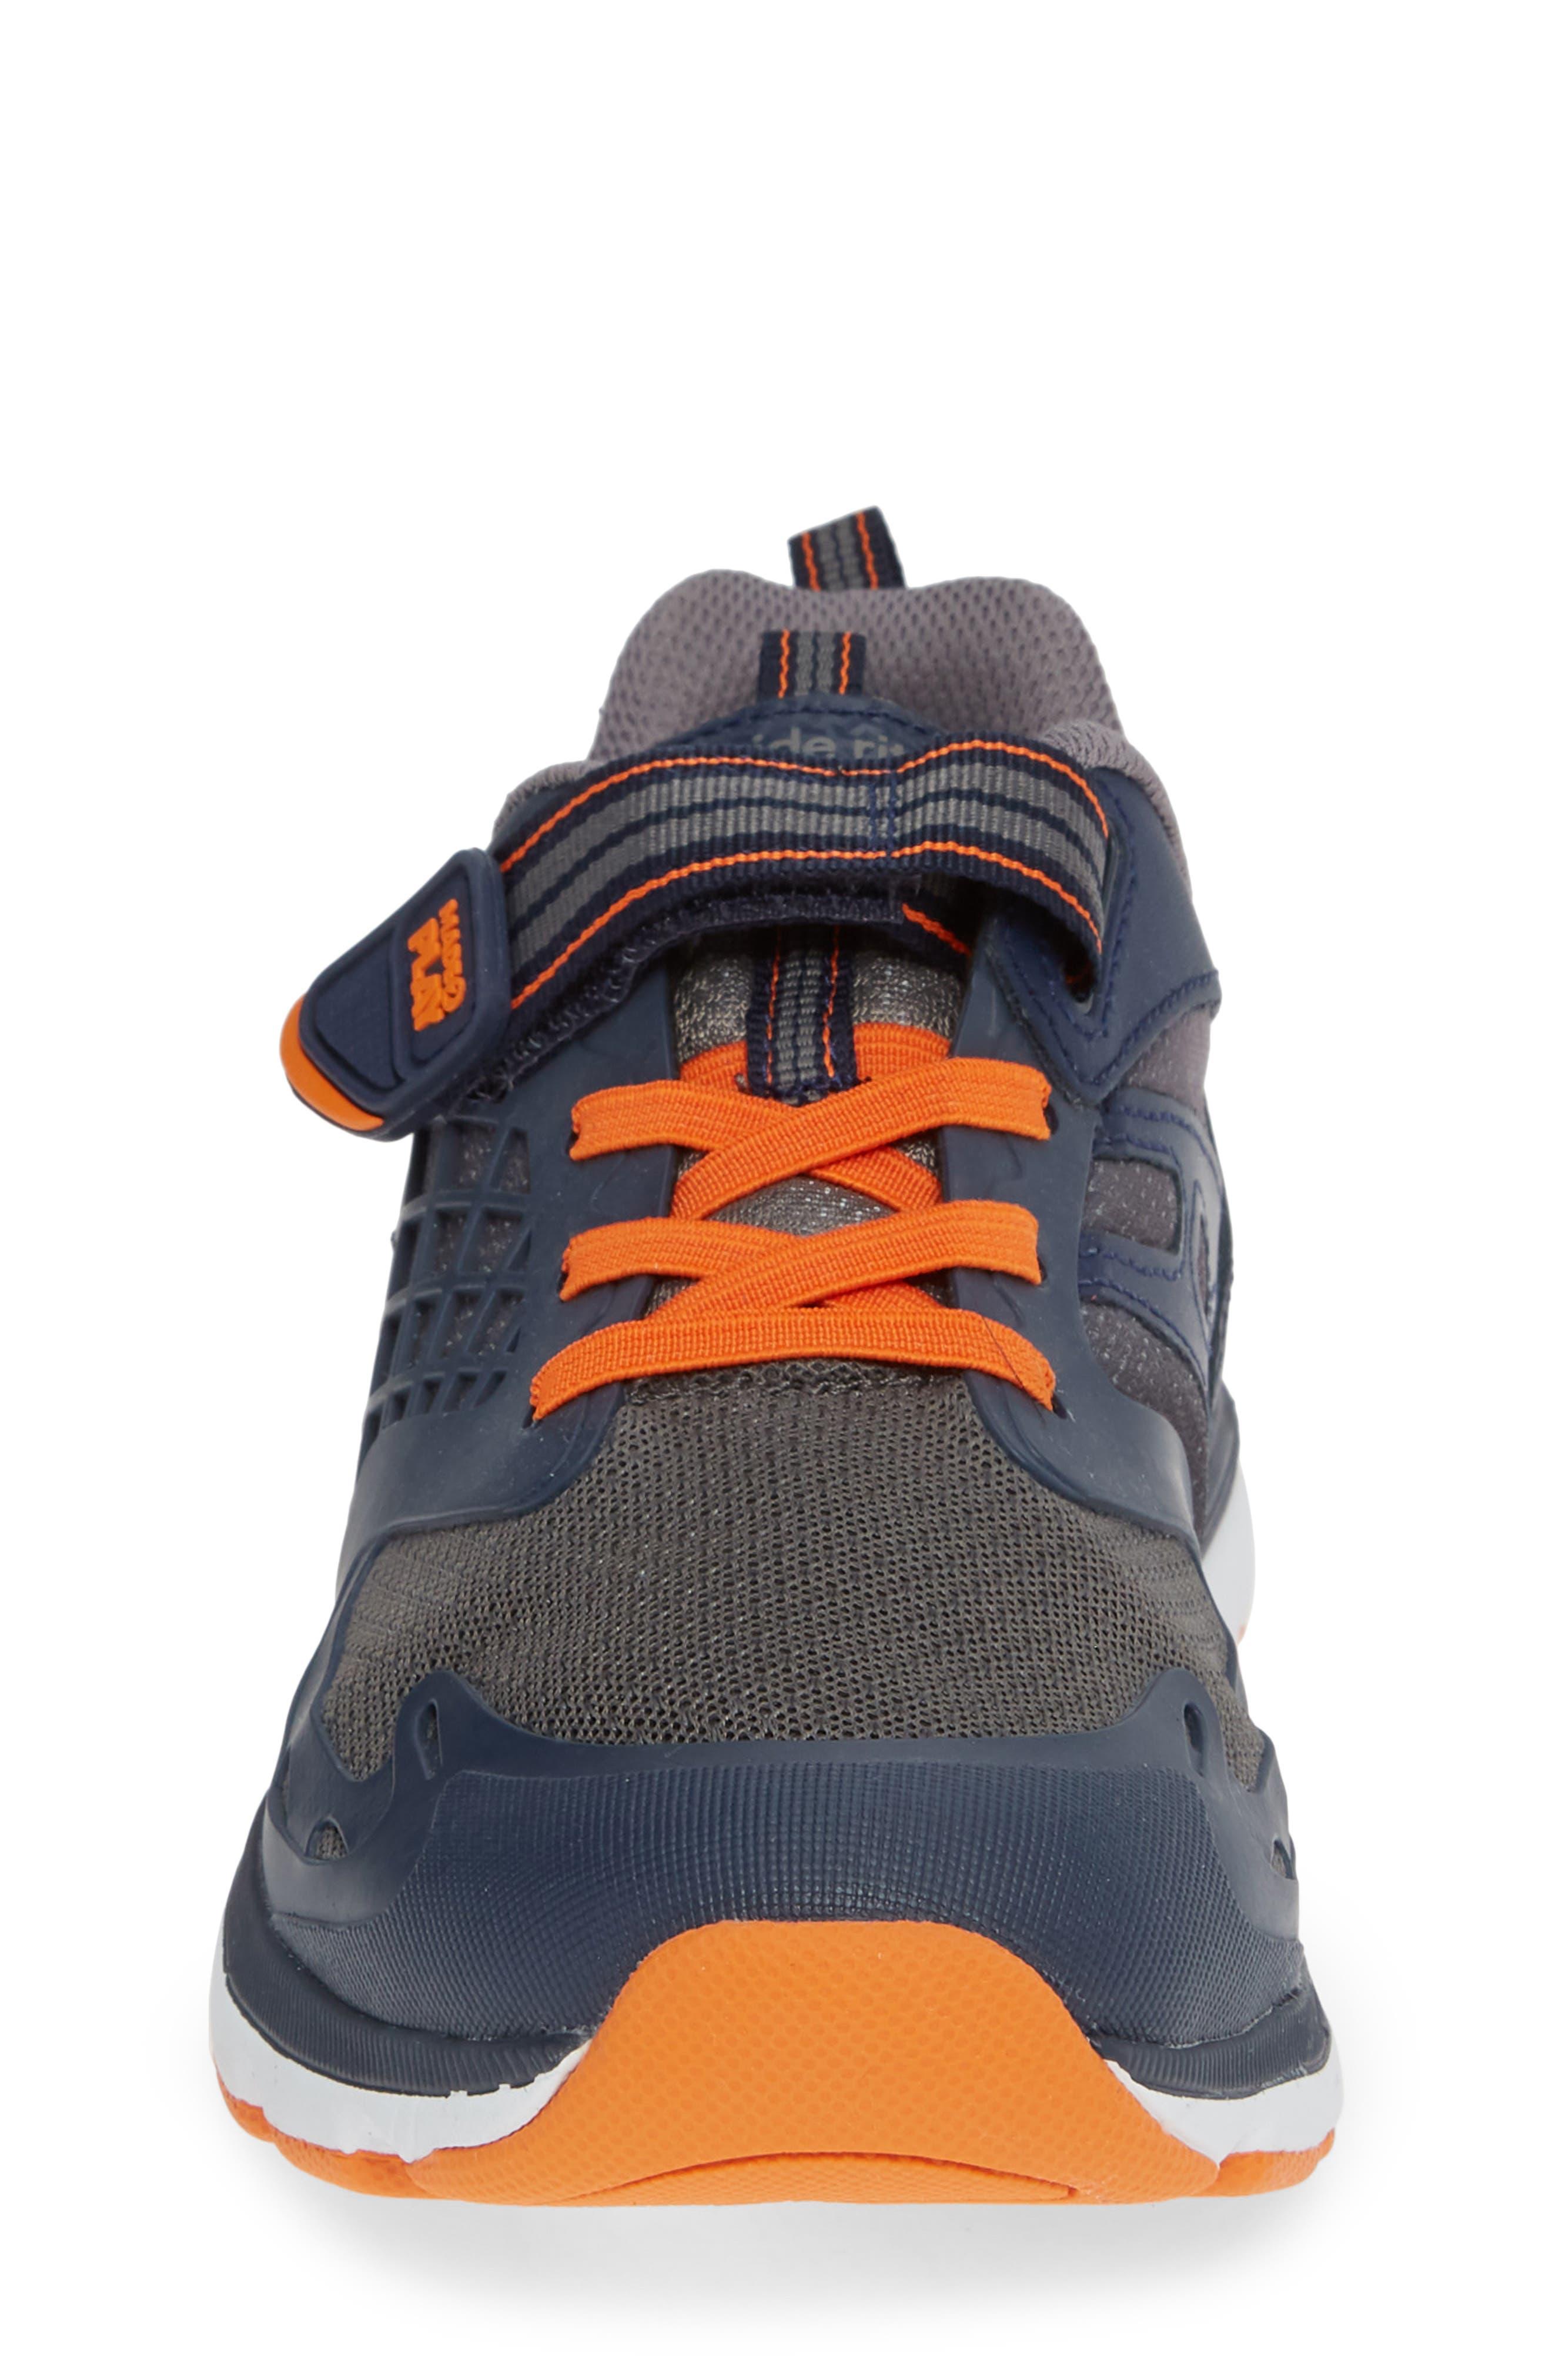 Made 2 Play Breccen Sneaker,                             Alternate thumbnail 4, color,                             NAVY/ ORANGE